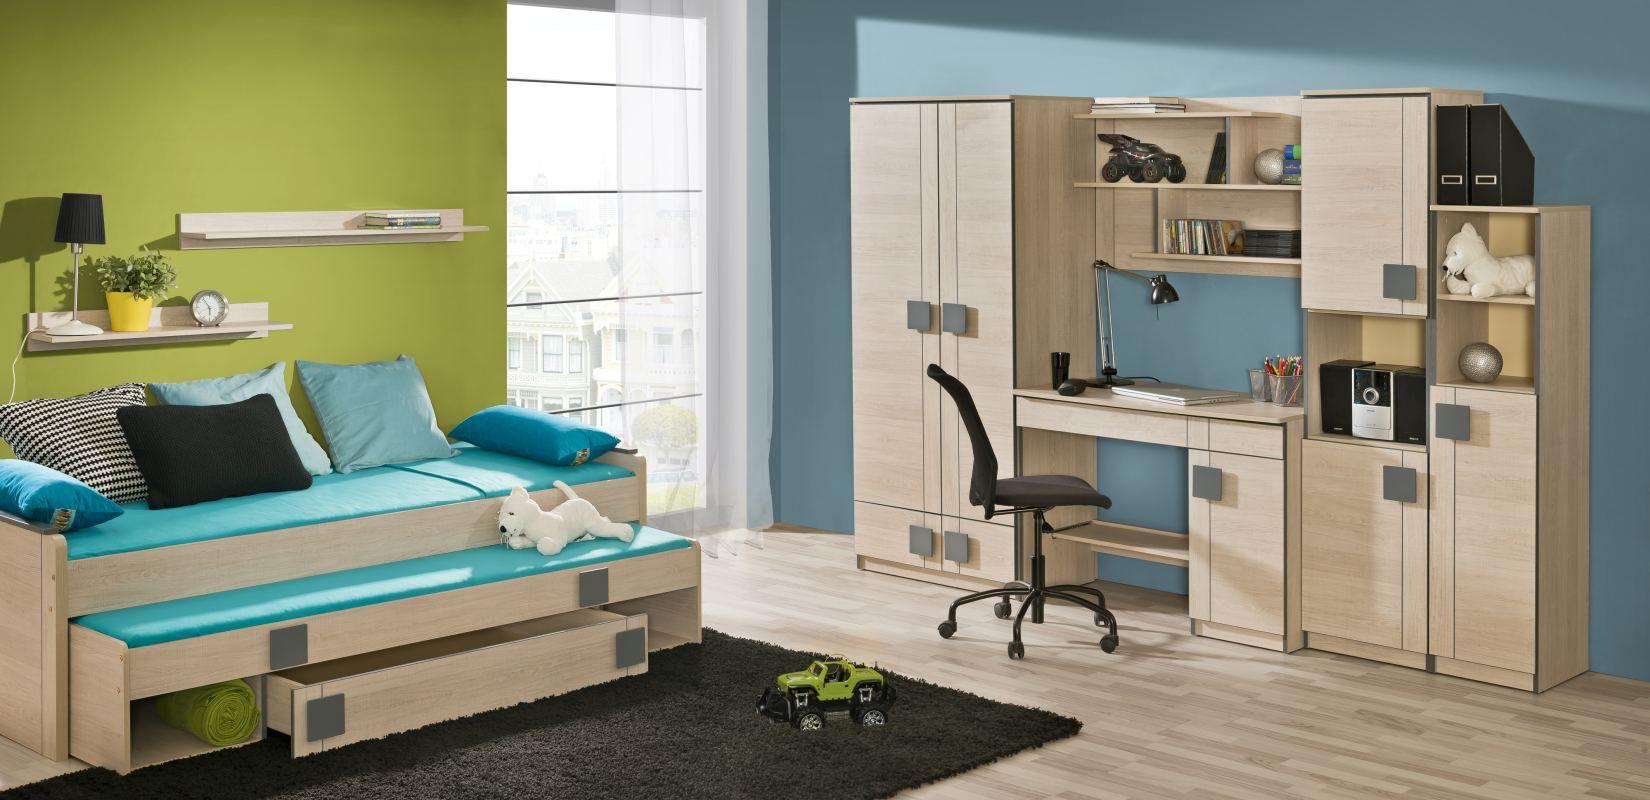 Jugendzimmer Komplett - Set A Elias, 8-teilig, Farbe: Hellbraun / Grau